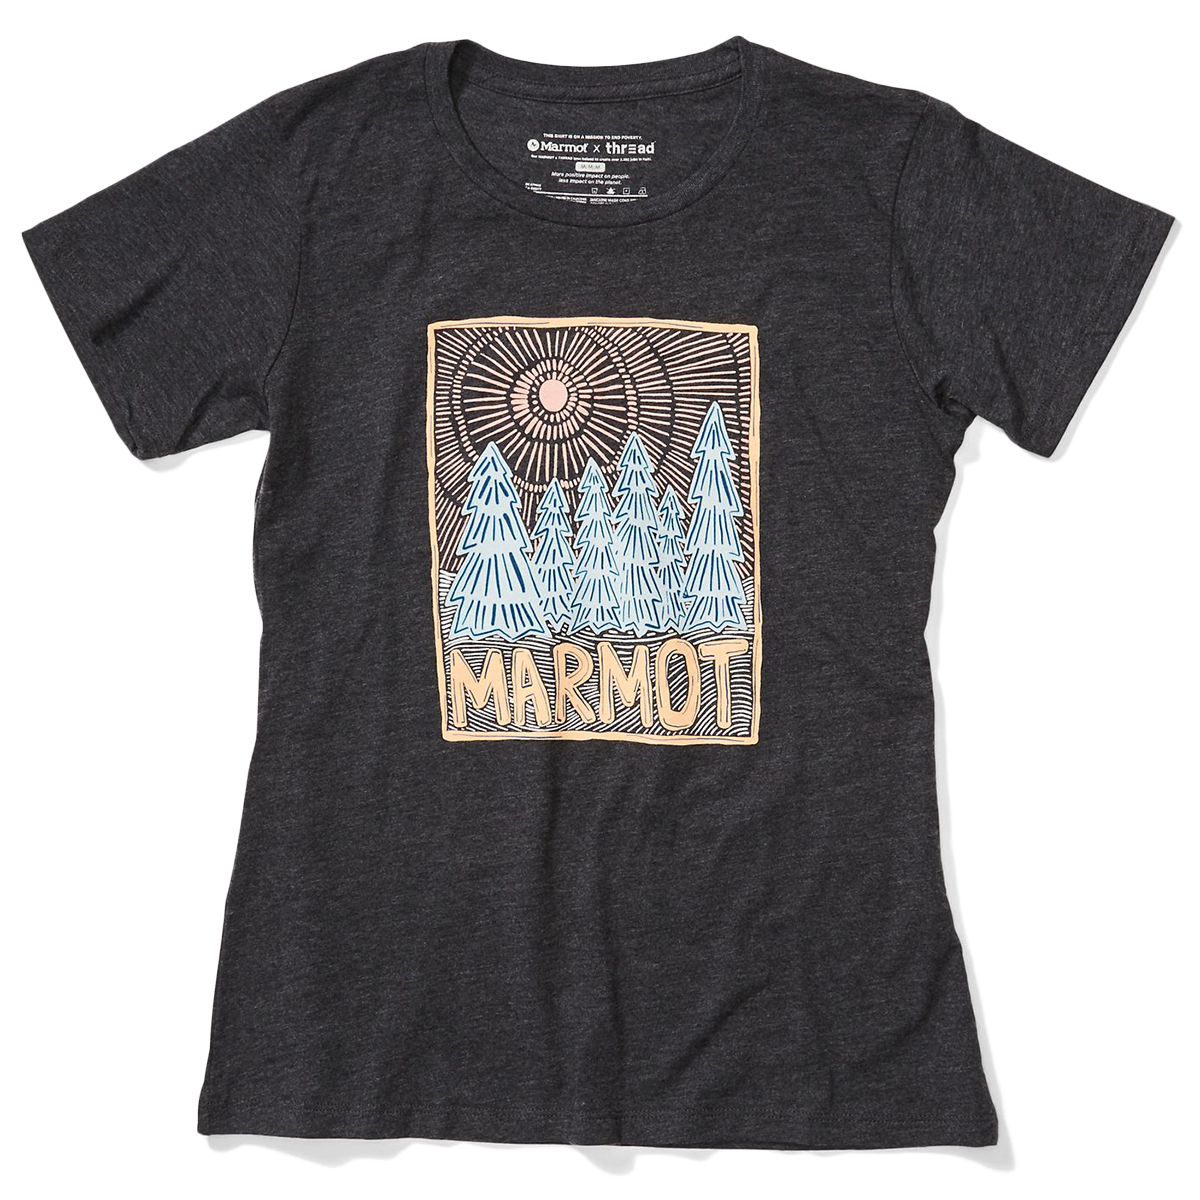 Marmot Women's Woodblock Short-Sleeve Tee - Black, L